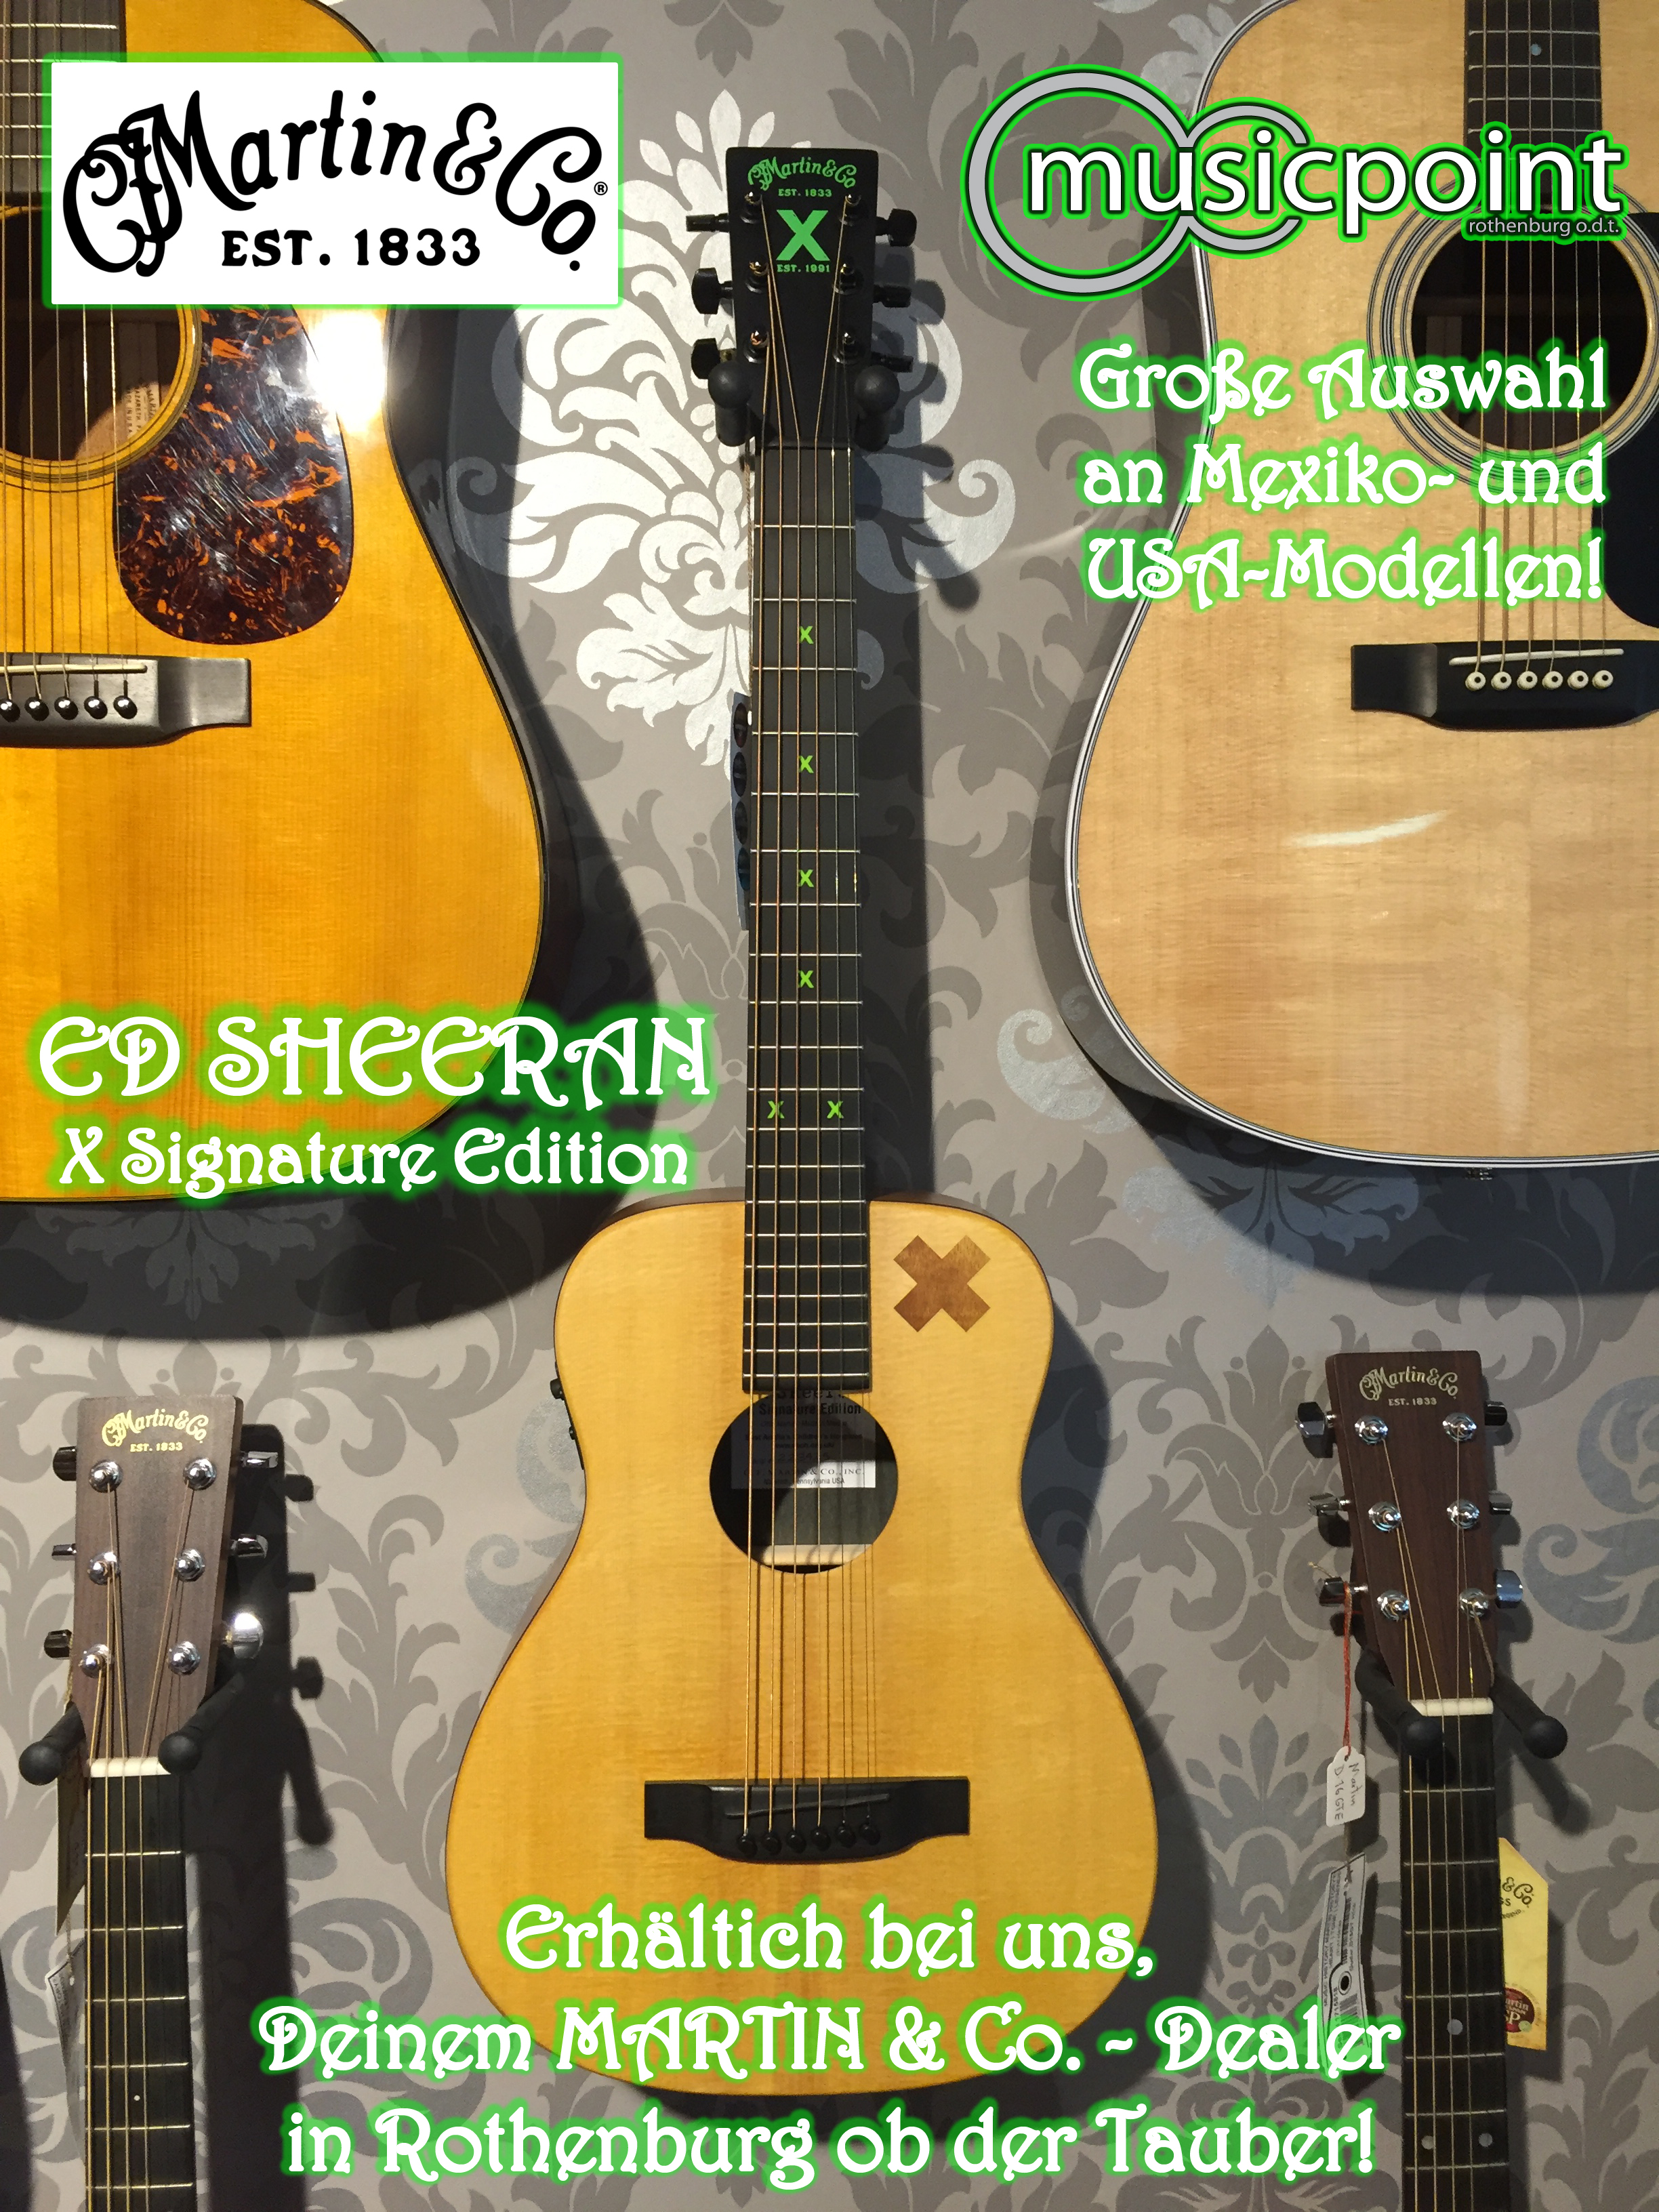 Martin_ED_Sheeran_Signature_musicpoint